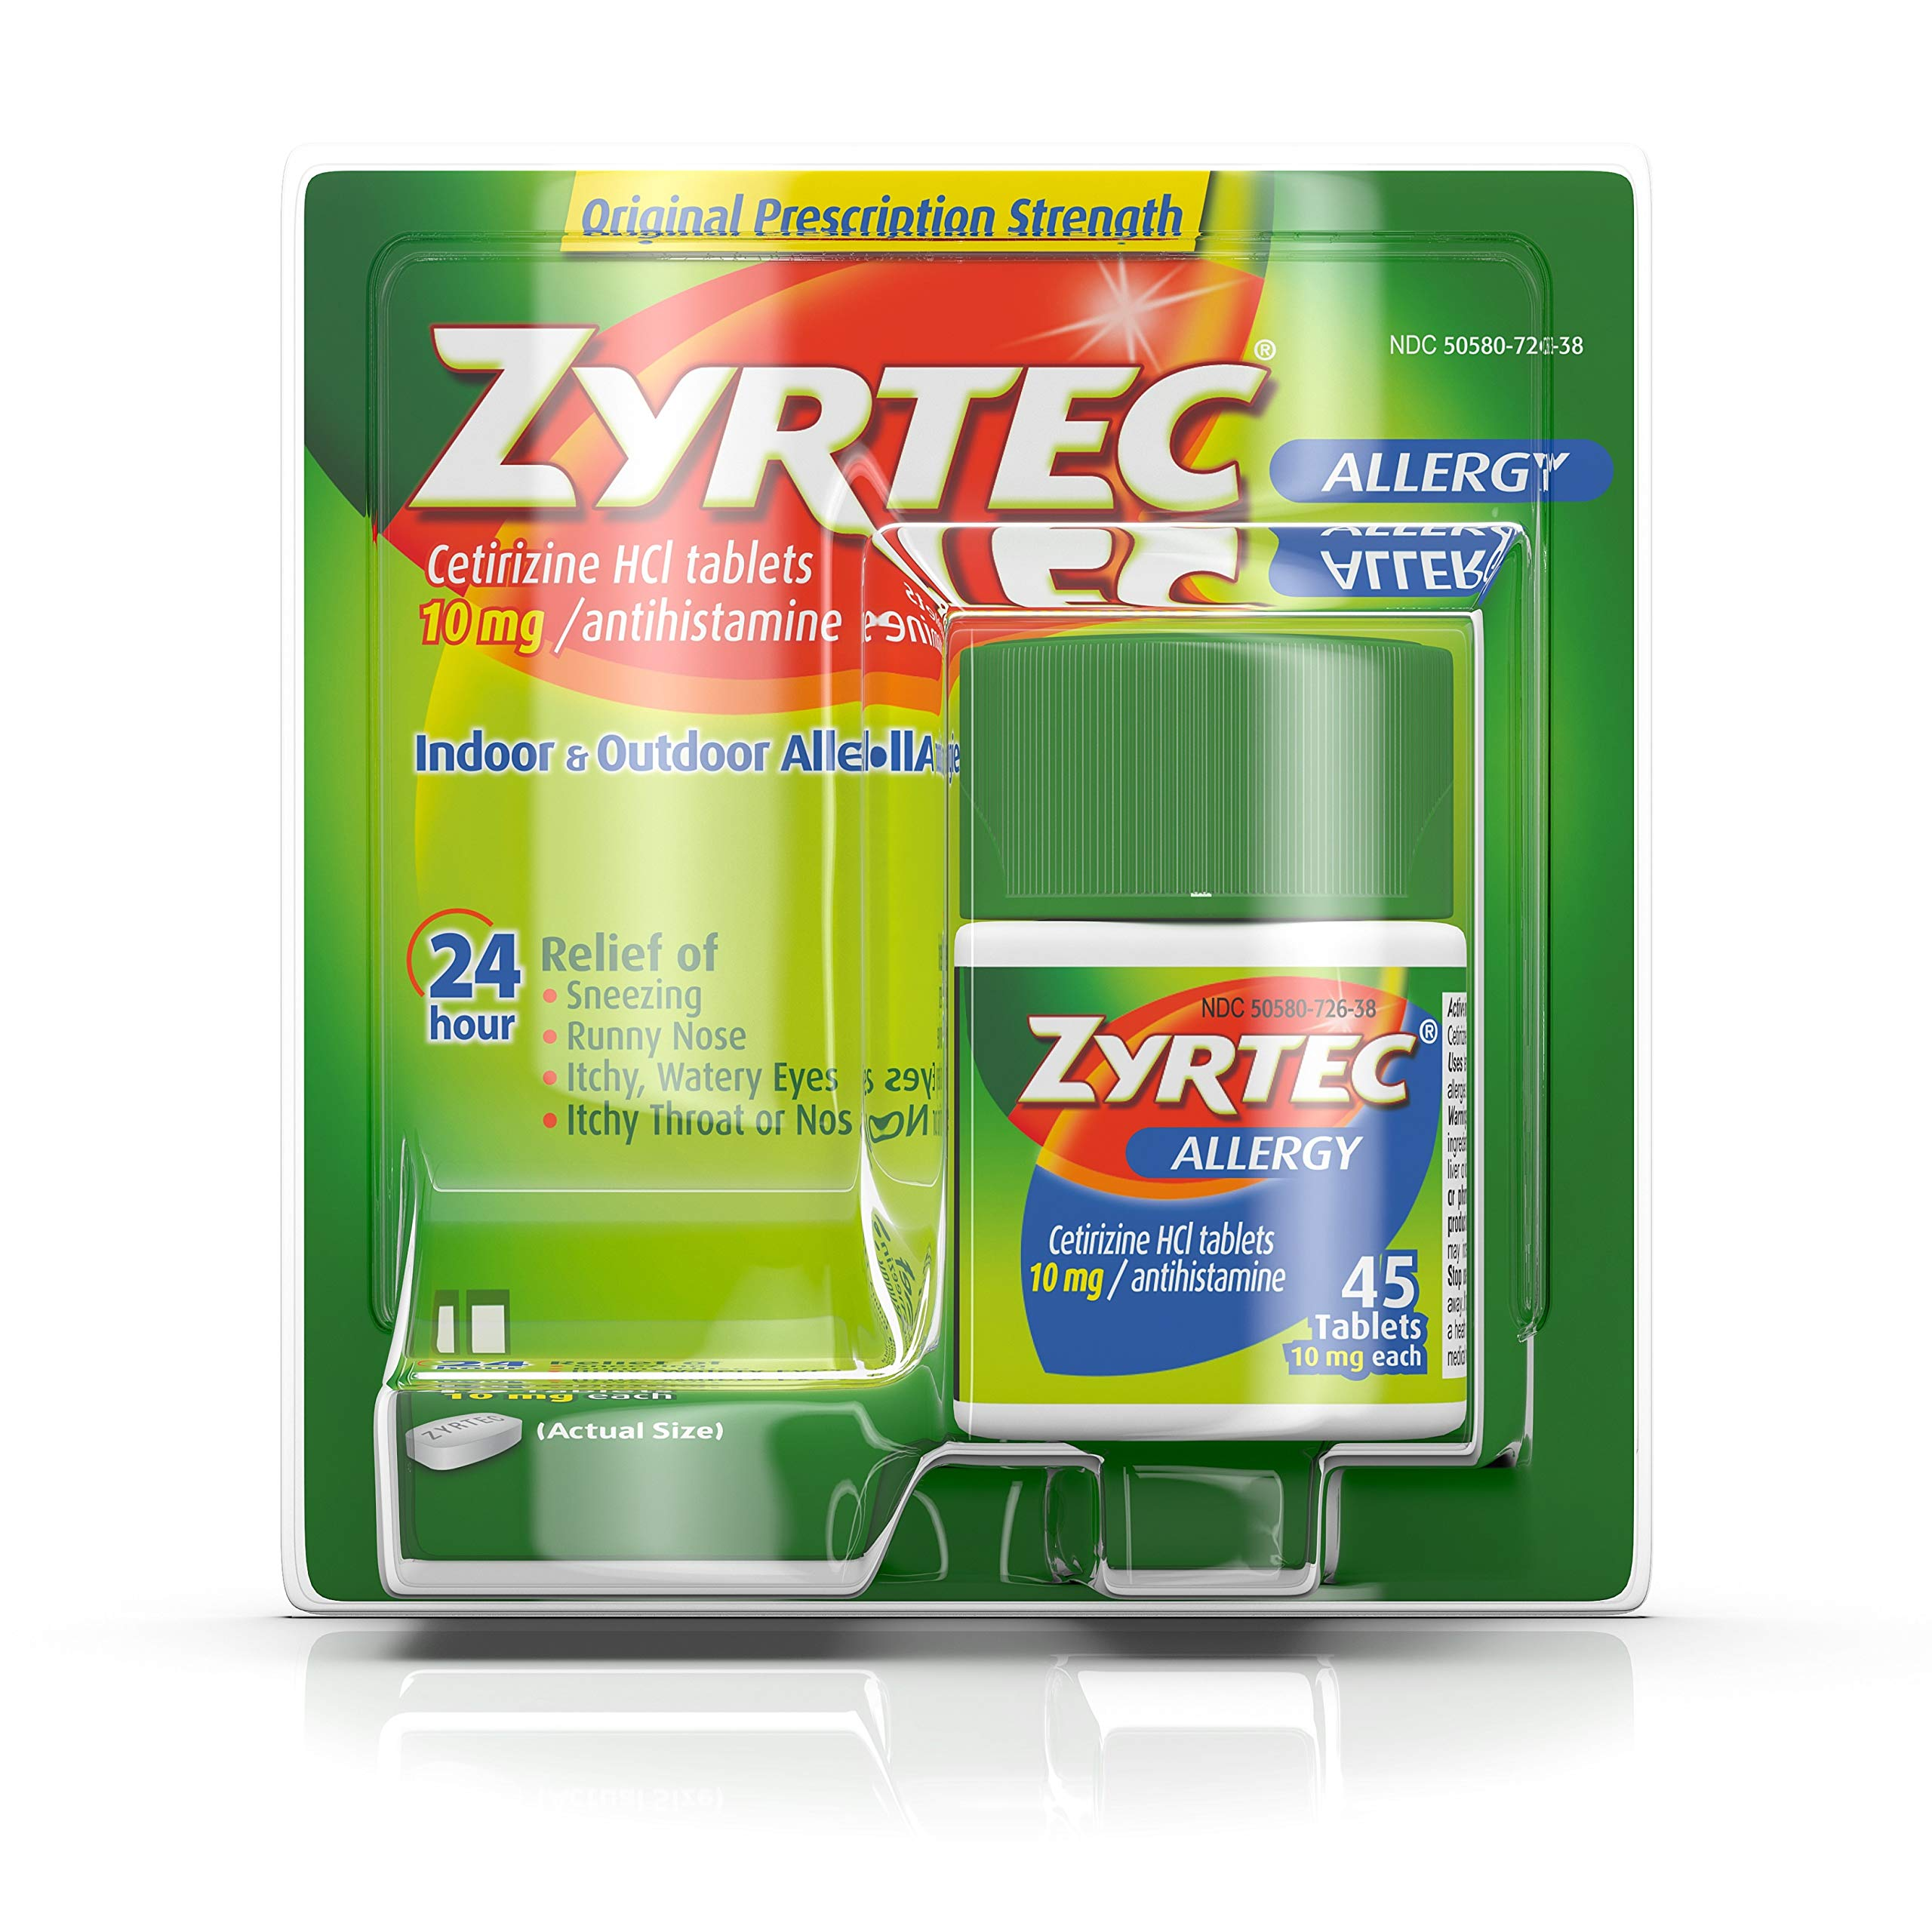 Zyrtec 24 Hour Allergy Relief Tablets, 10 mg Cetirizine HCl Antihistamine Allergy Medicine, 45 ct by Zyrtec